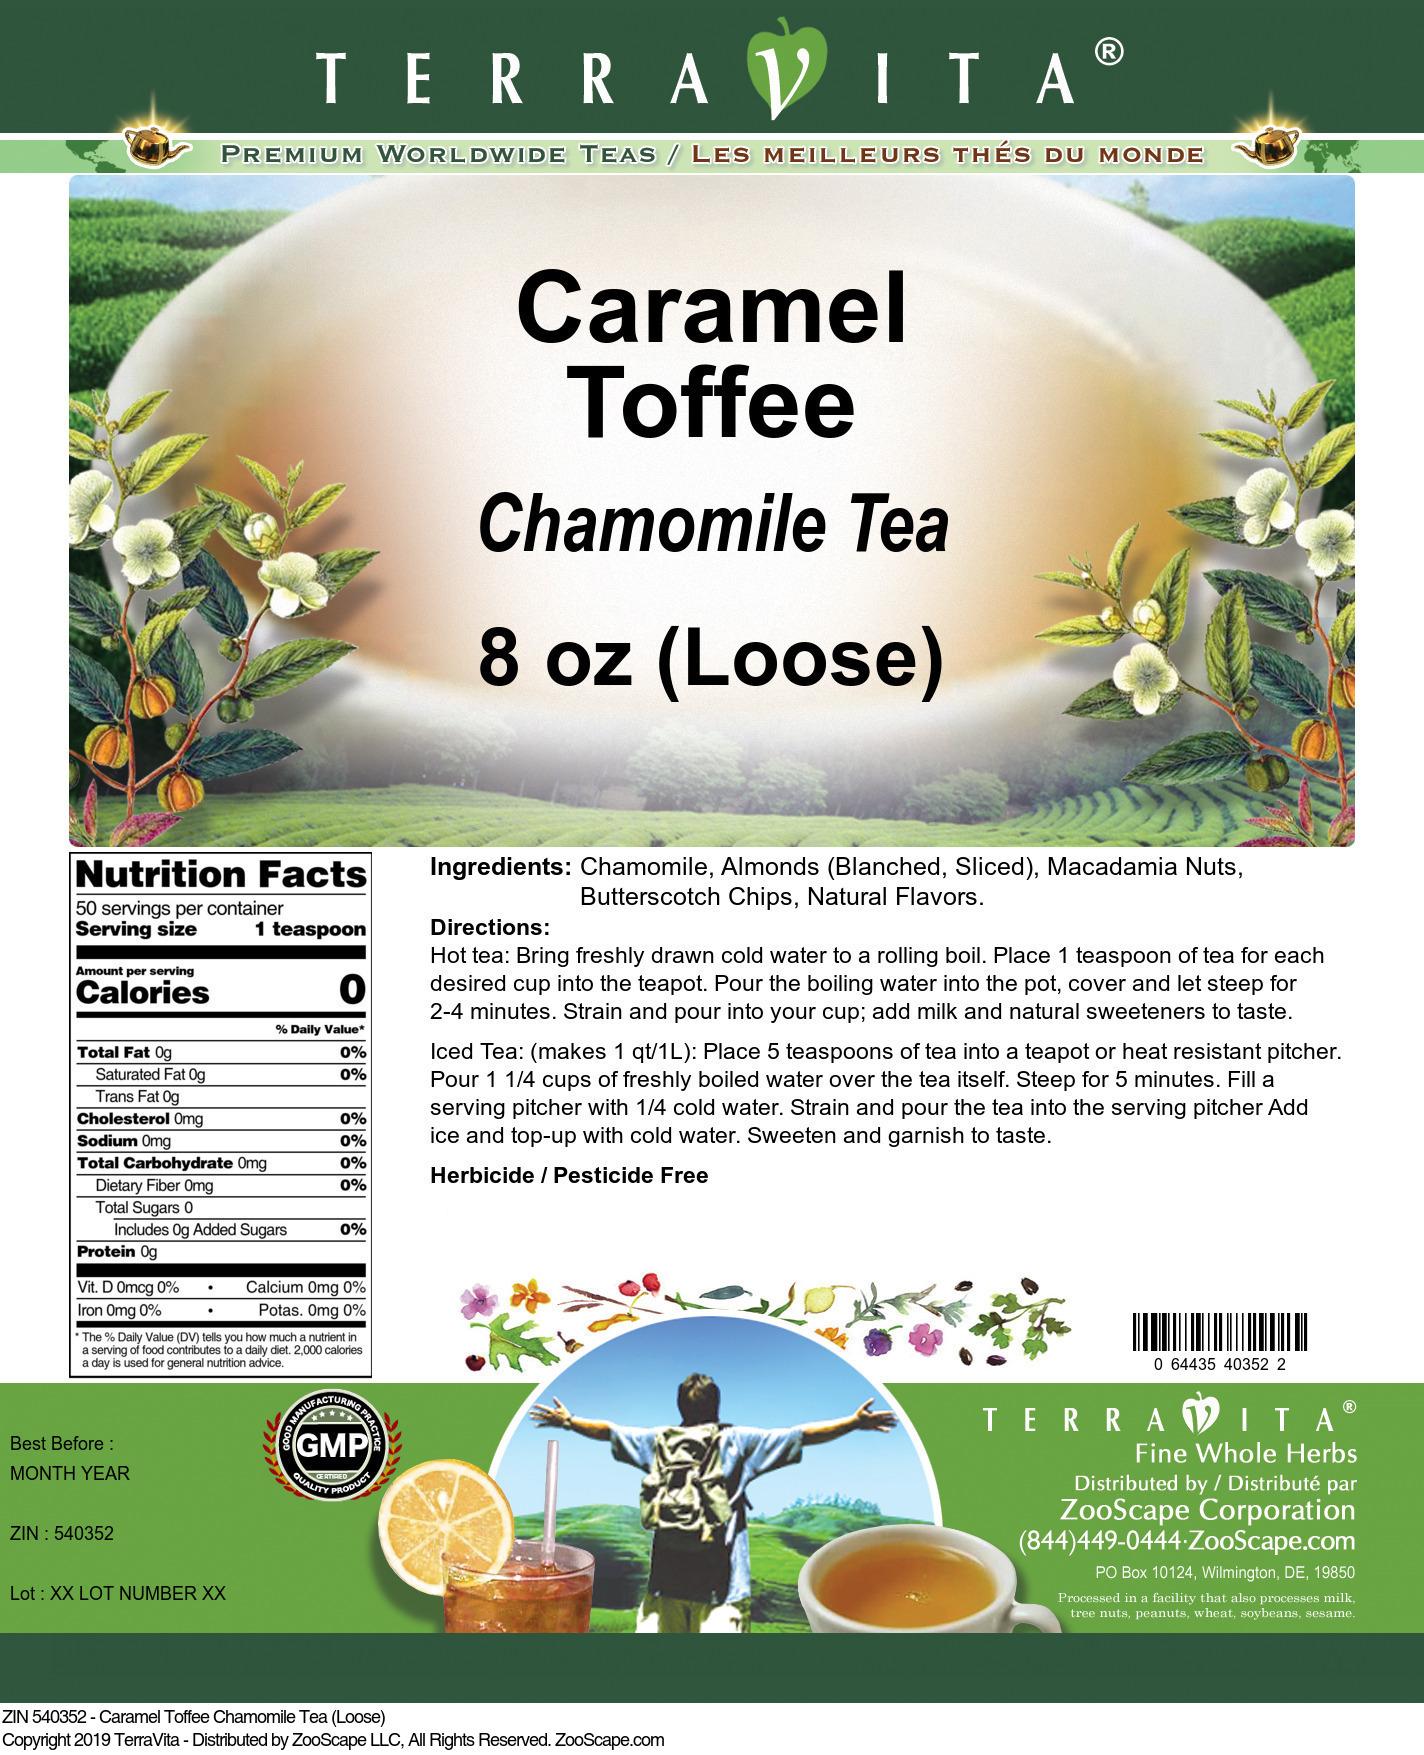 Caramel Toffee Chamomile Tea